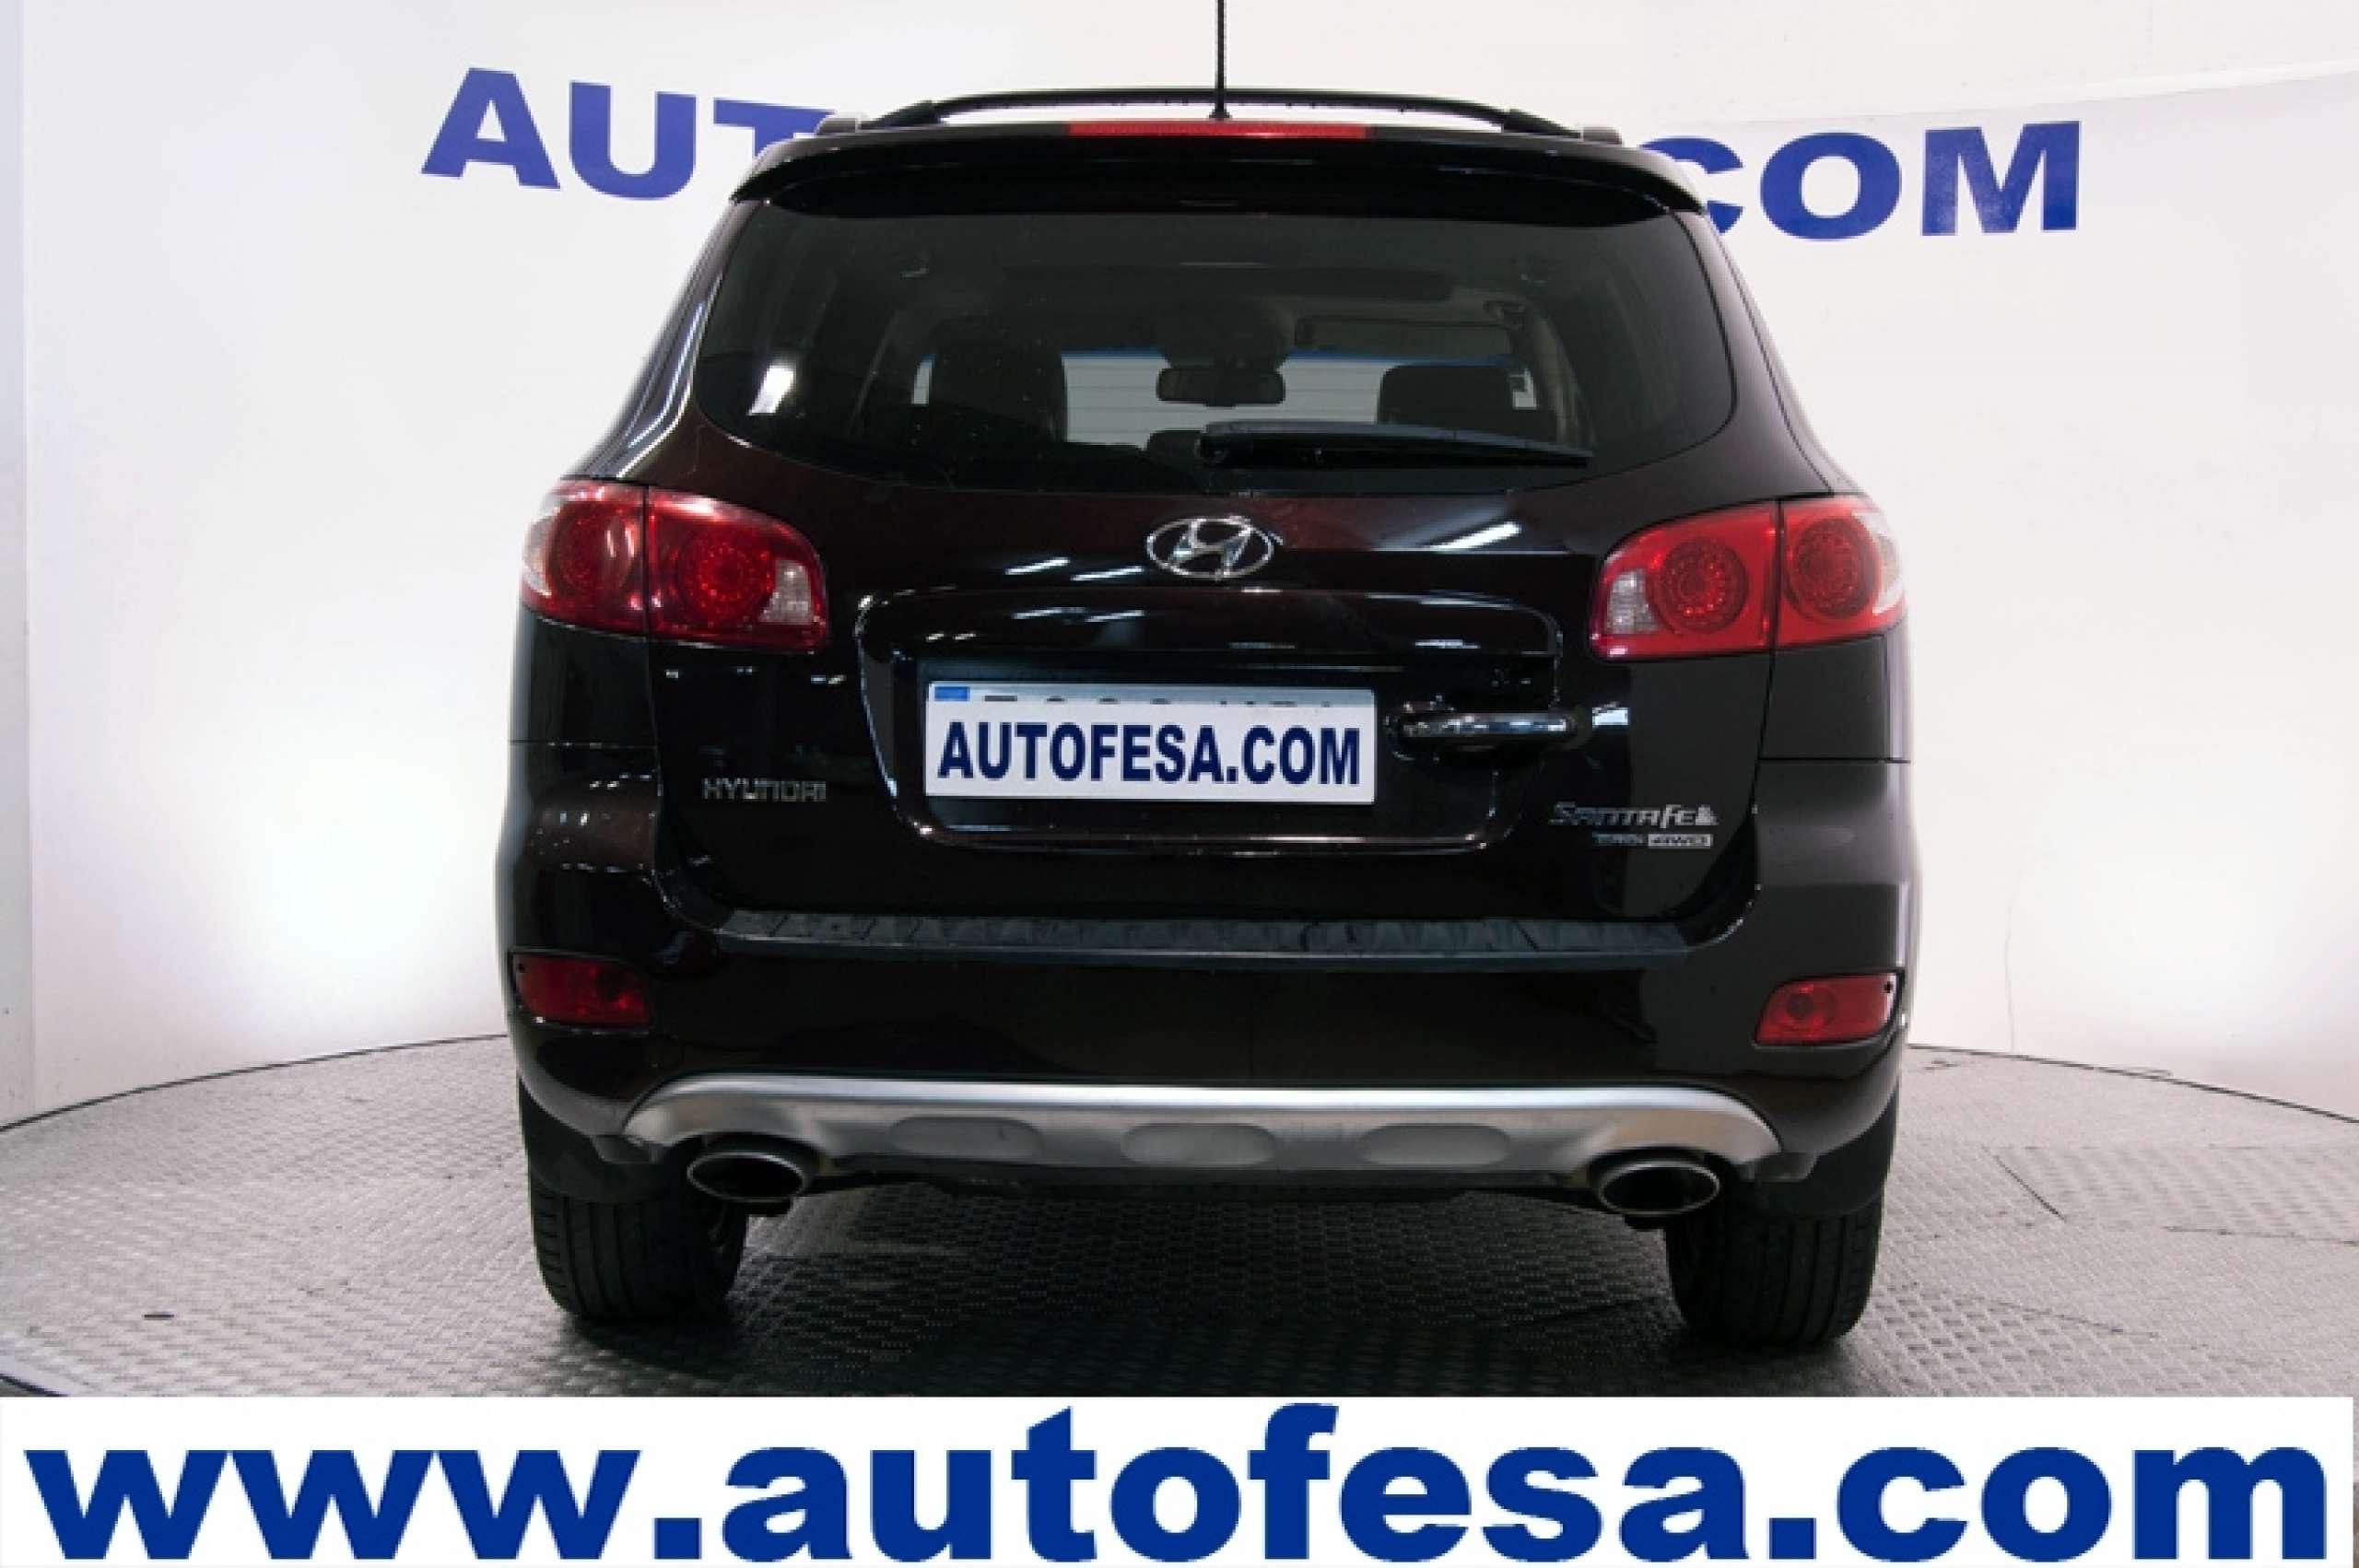 Hyundai Santa Fe 2.2 CRDI 155cv Style Auto 5p - Foto 7